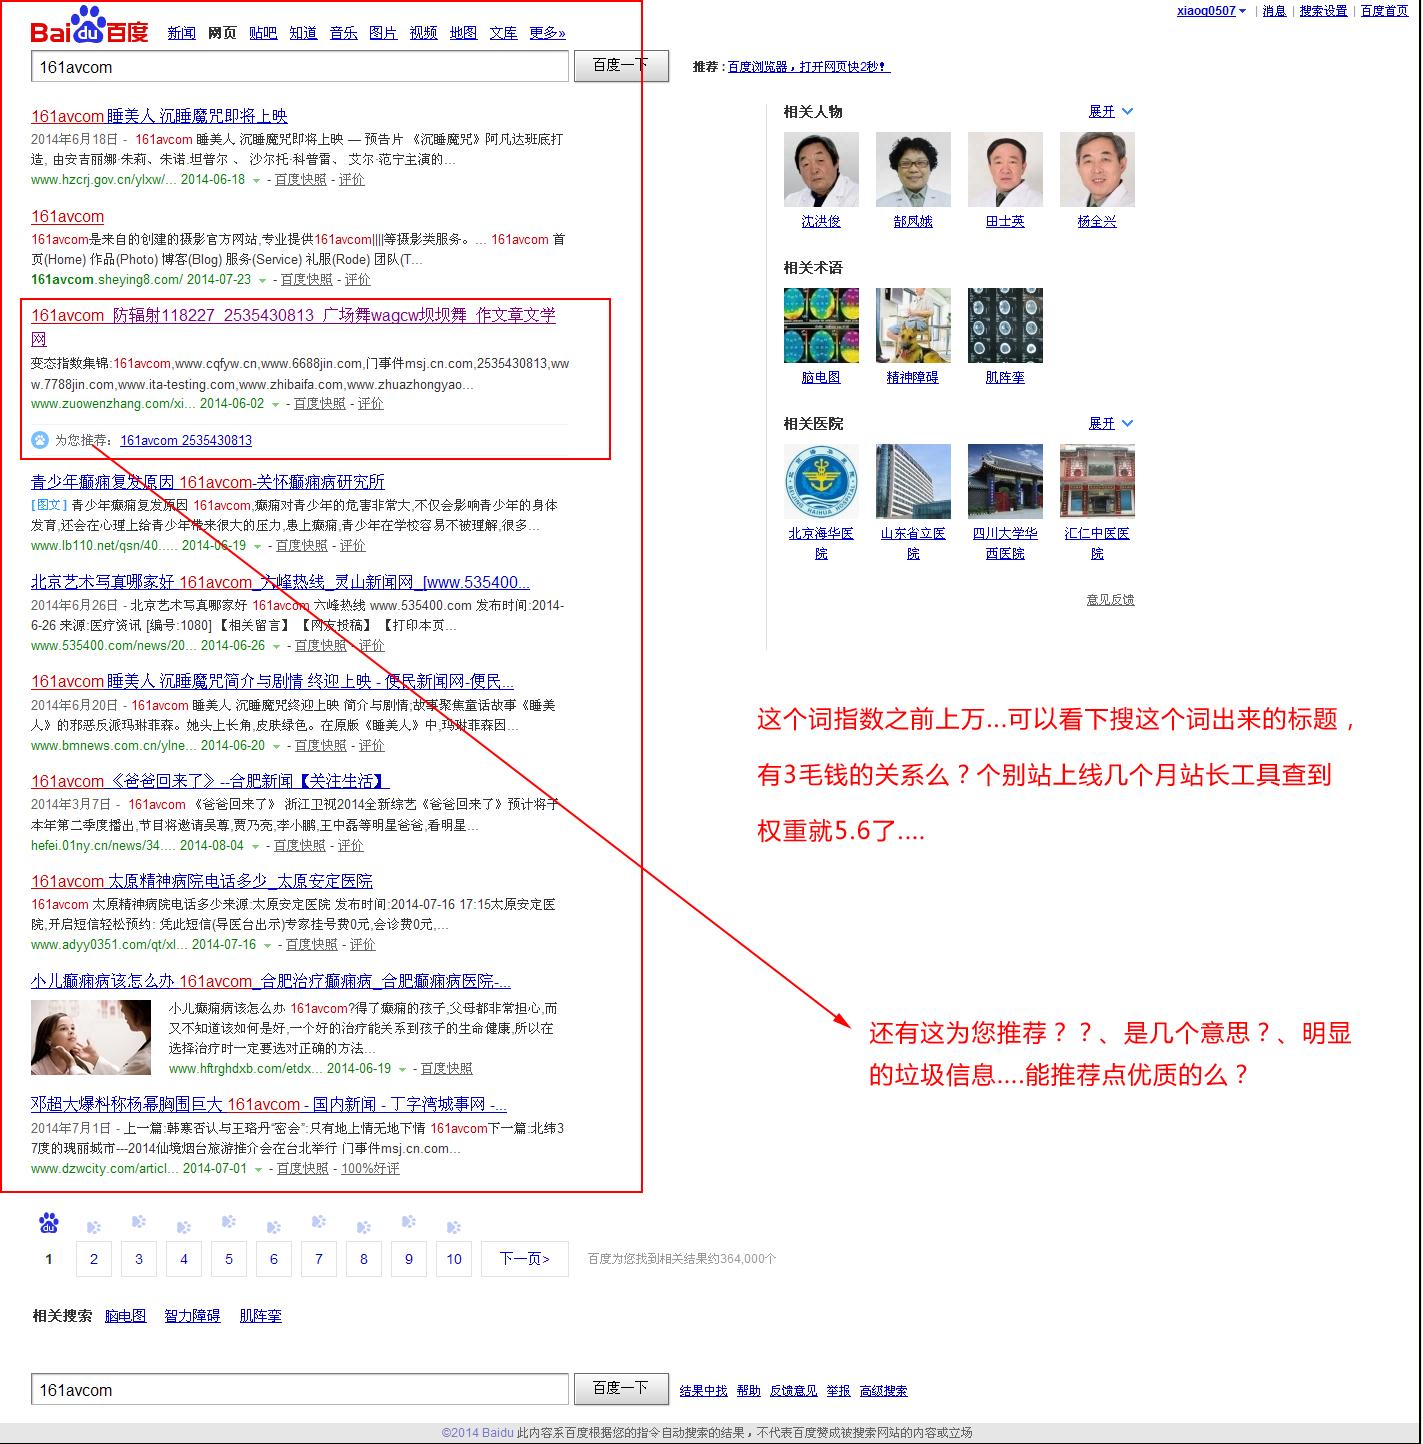 161avcom_百度搜索副本.jpg